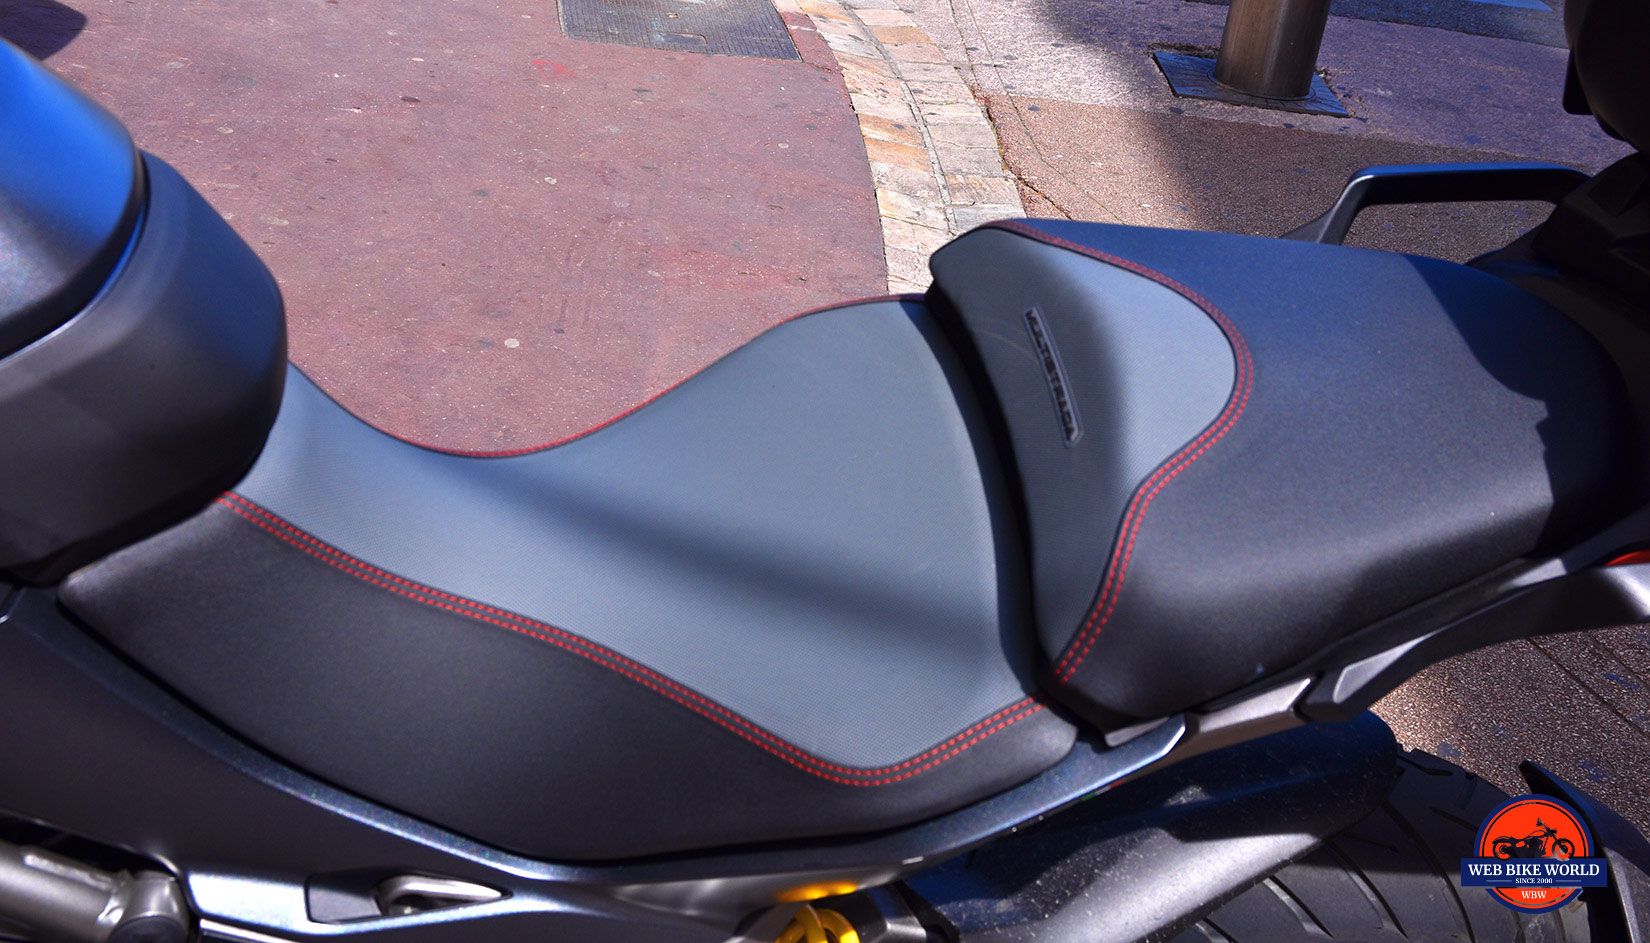 2019 Ducati Multistrada 1260S seat.